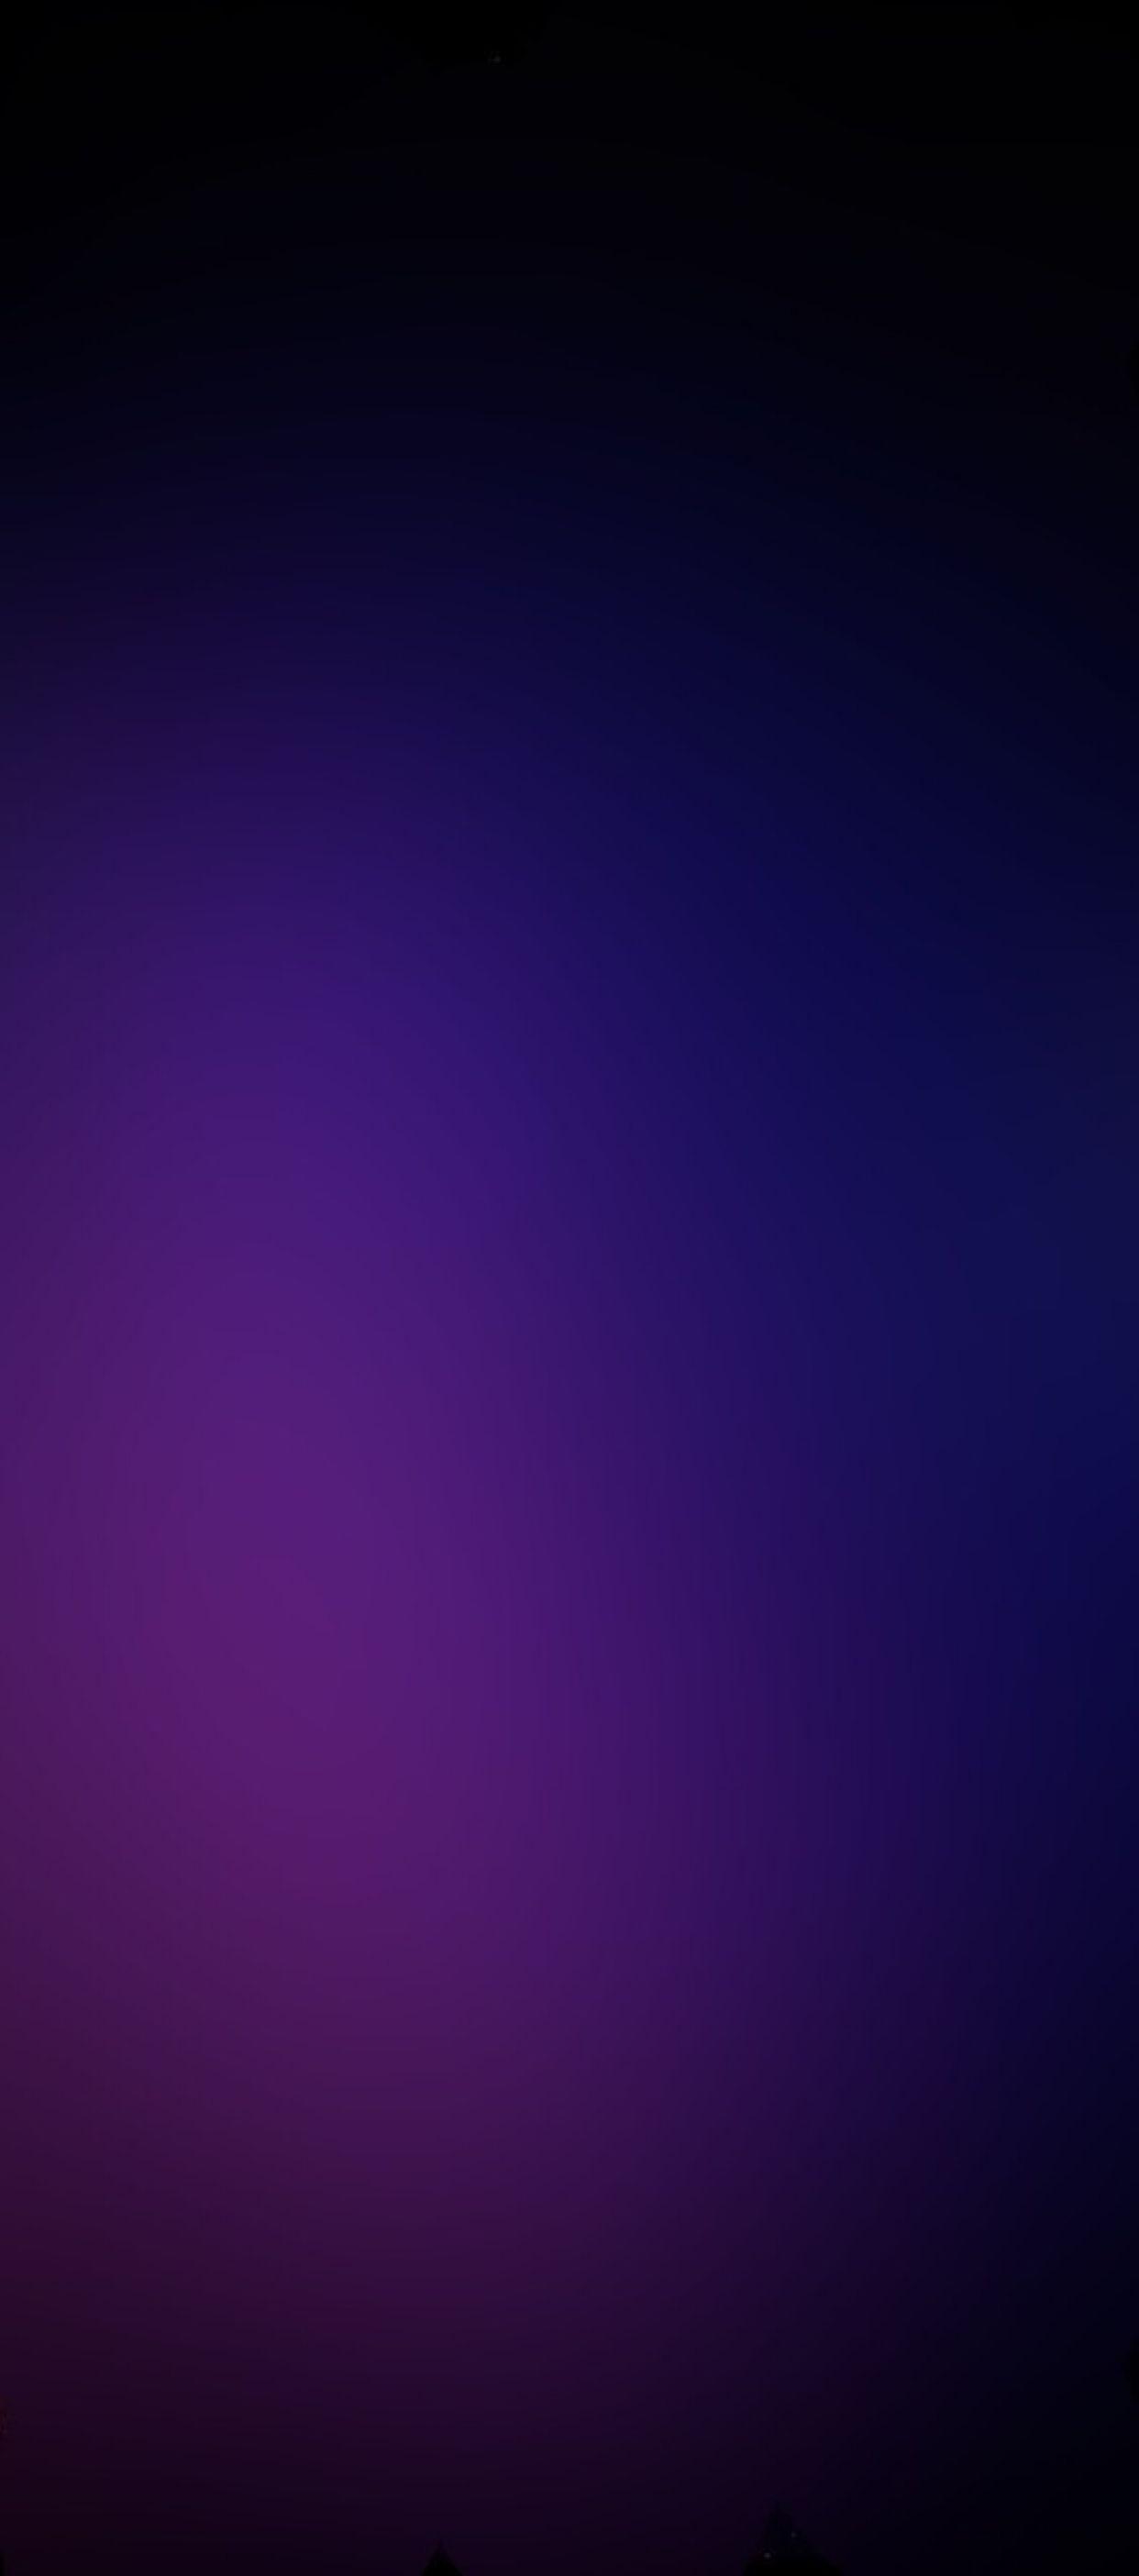 Purple wallpaper clean galaxy colour abstract digital art s8